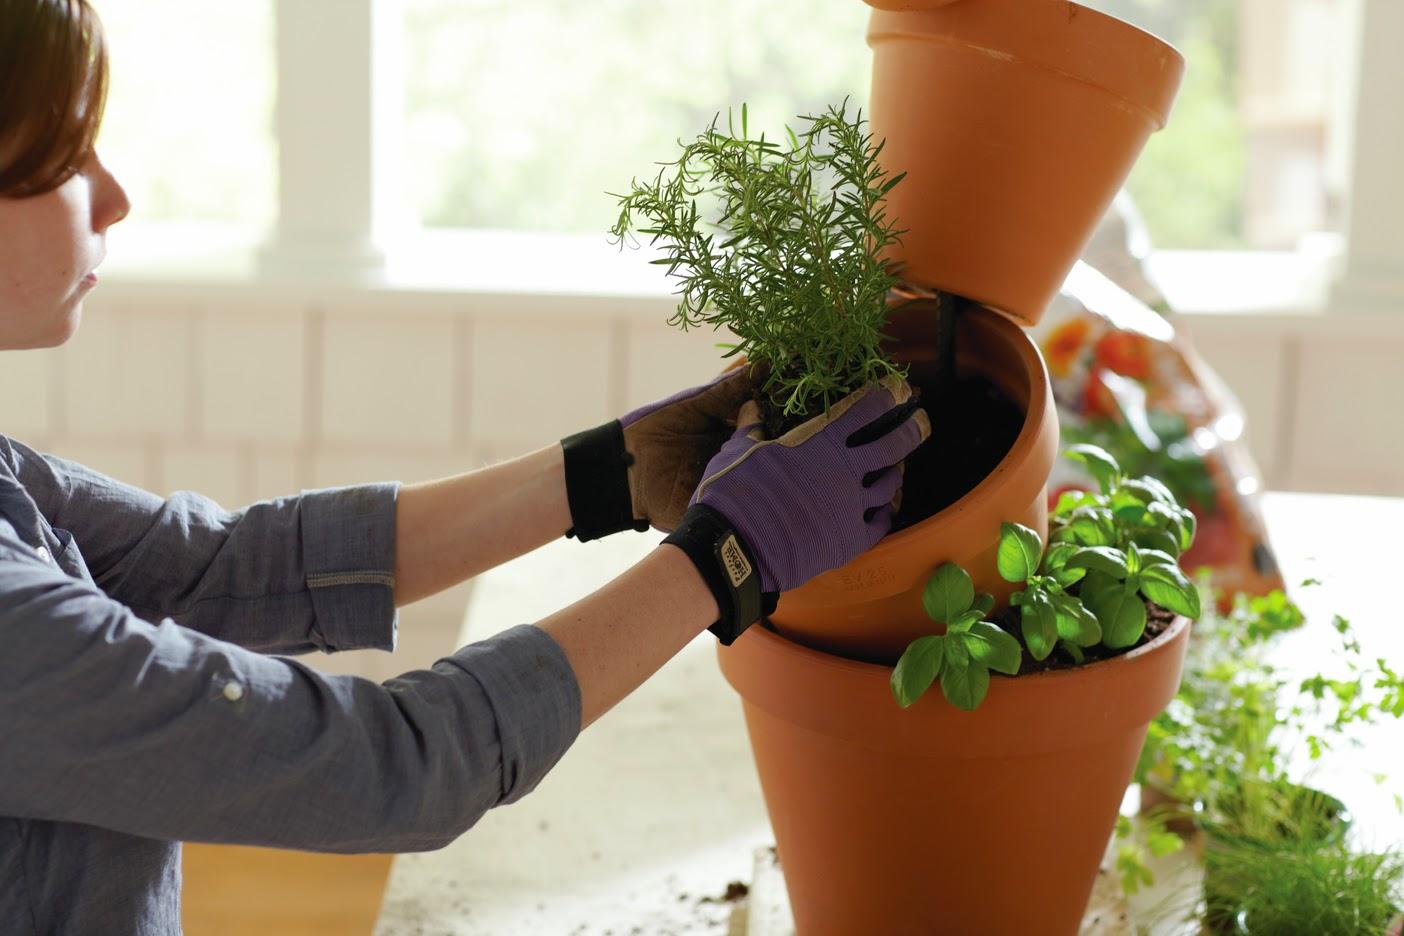 Gardening classes home depot home depot stock photos for Gardening classes near me